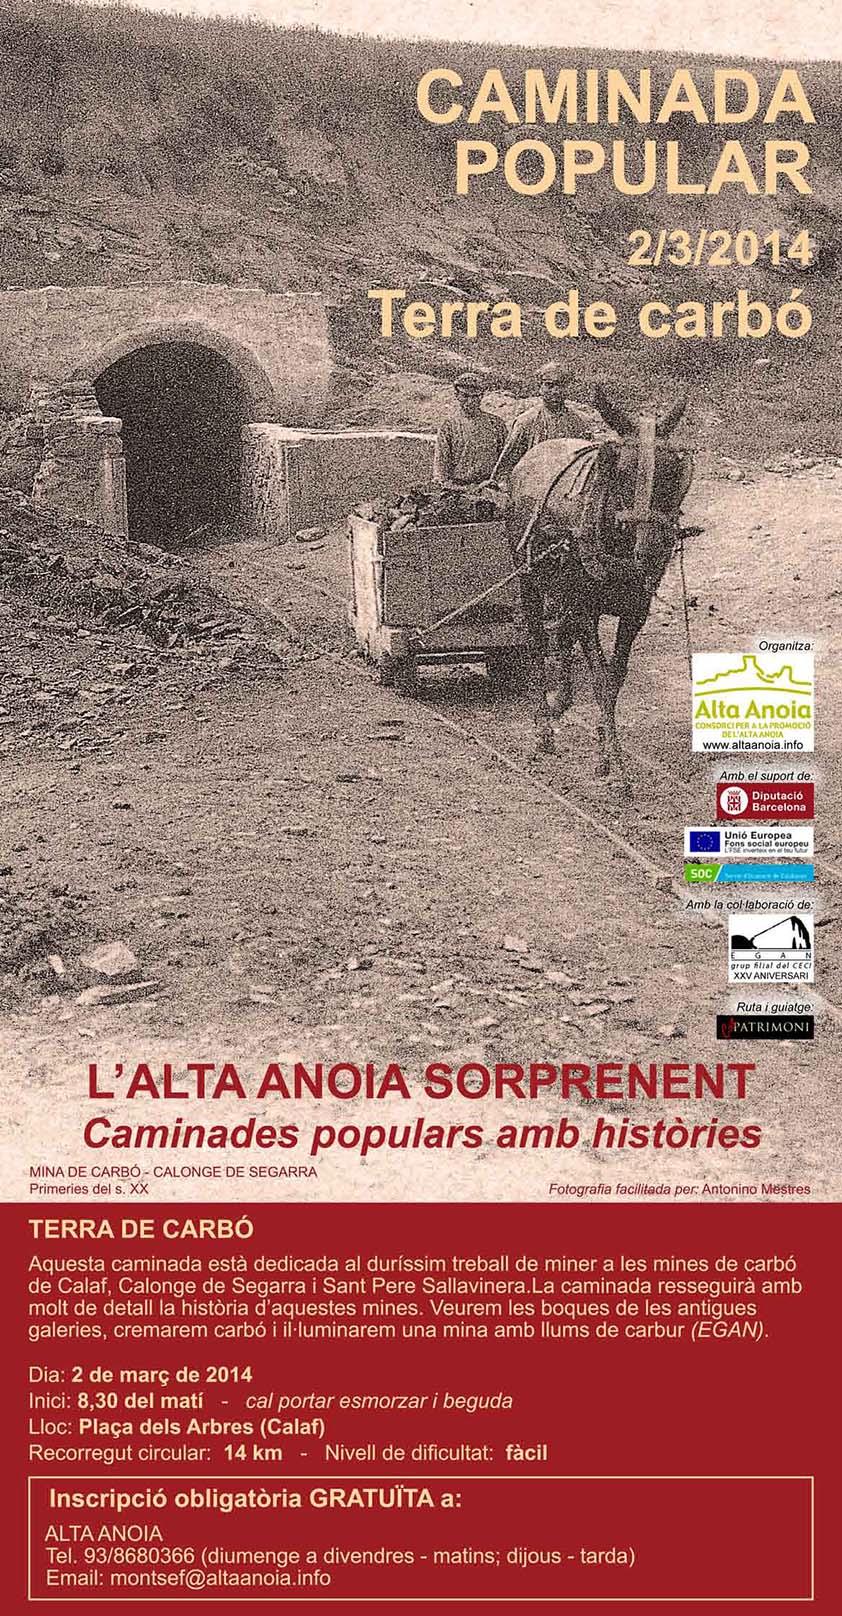 cartell Caminada popular 'Terra de carbó'